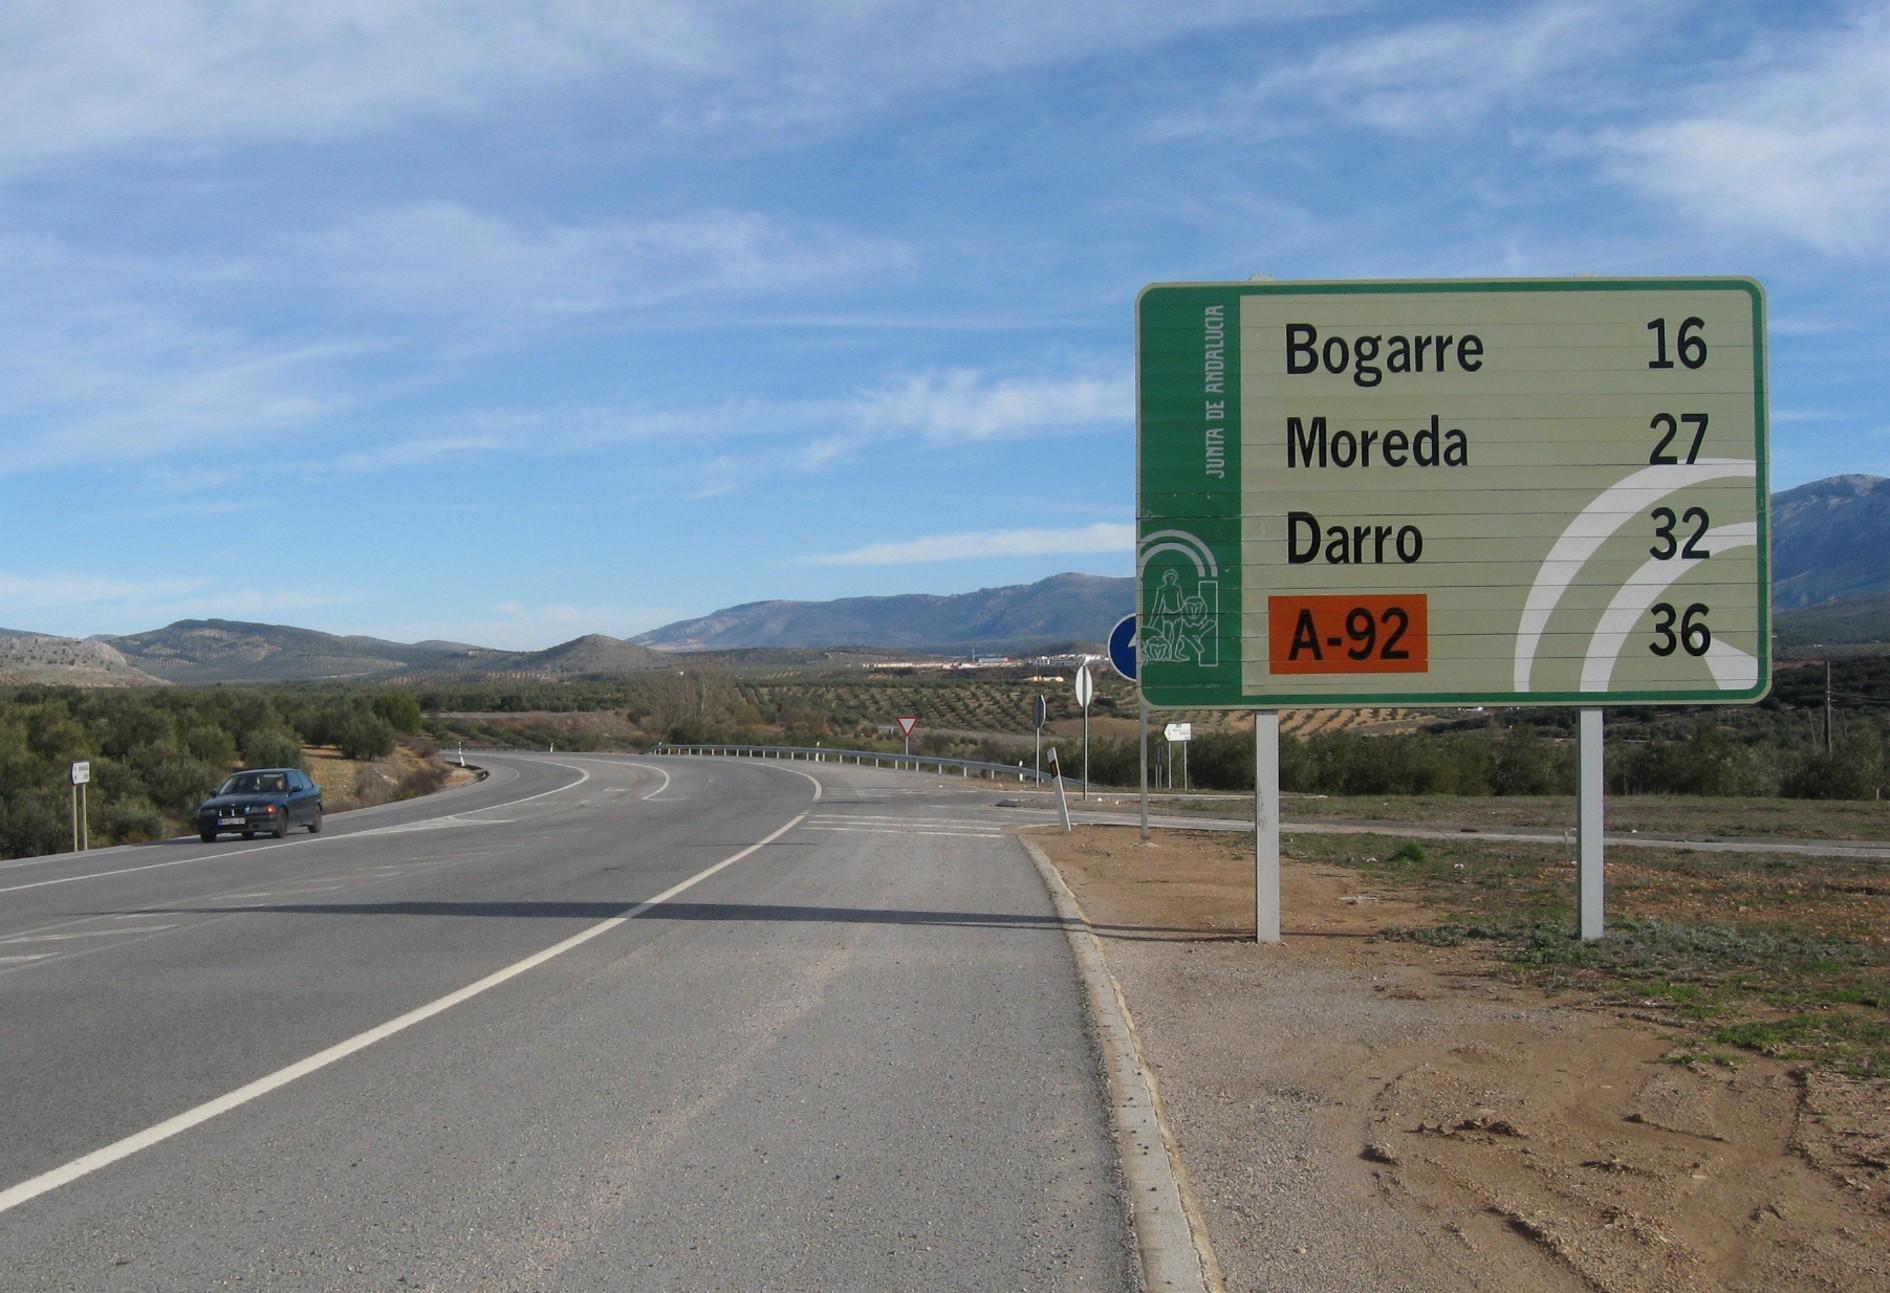 Imagen de la actual carretera autonómica convencional A-308 entre Iznalloz y Darro.